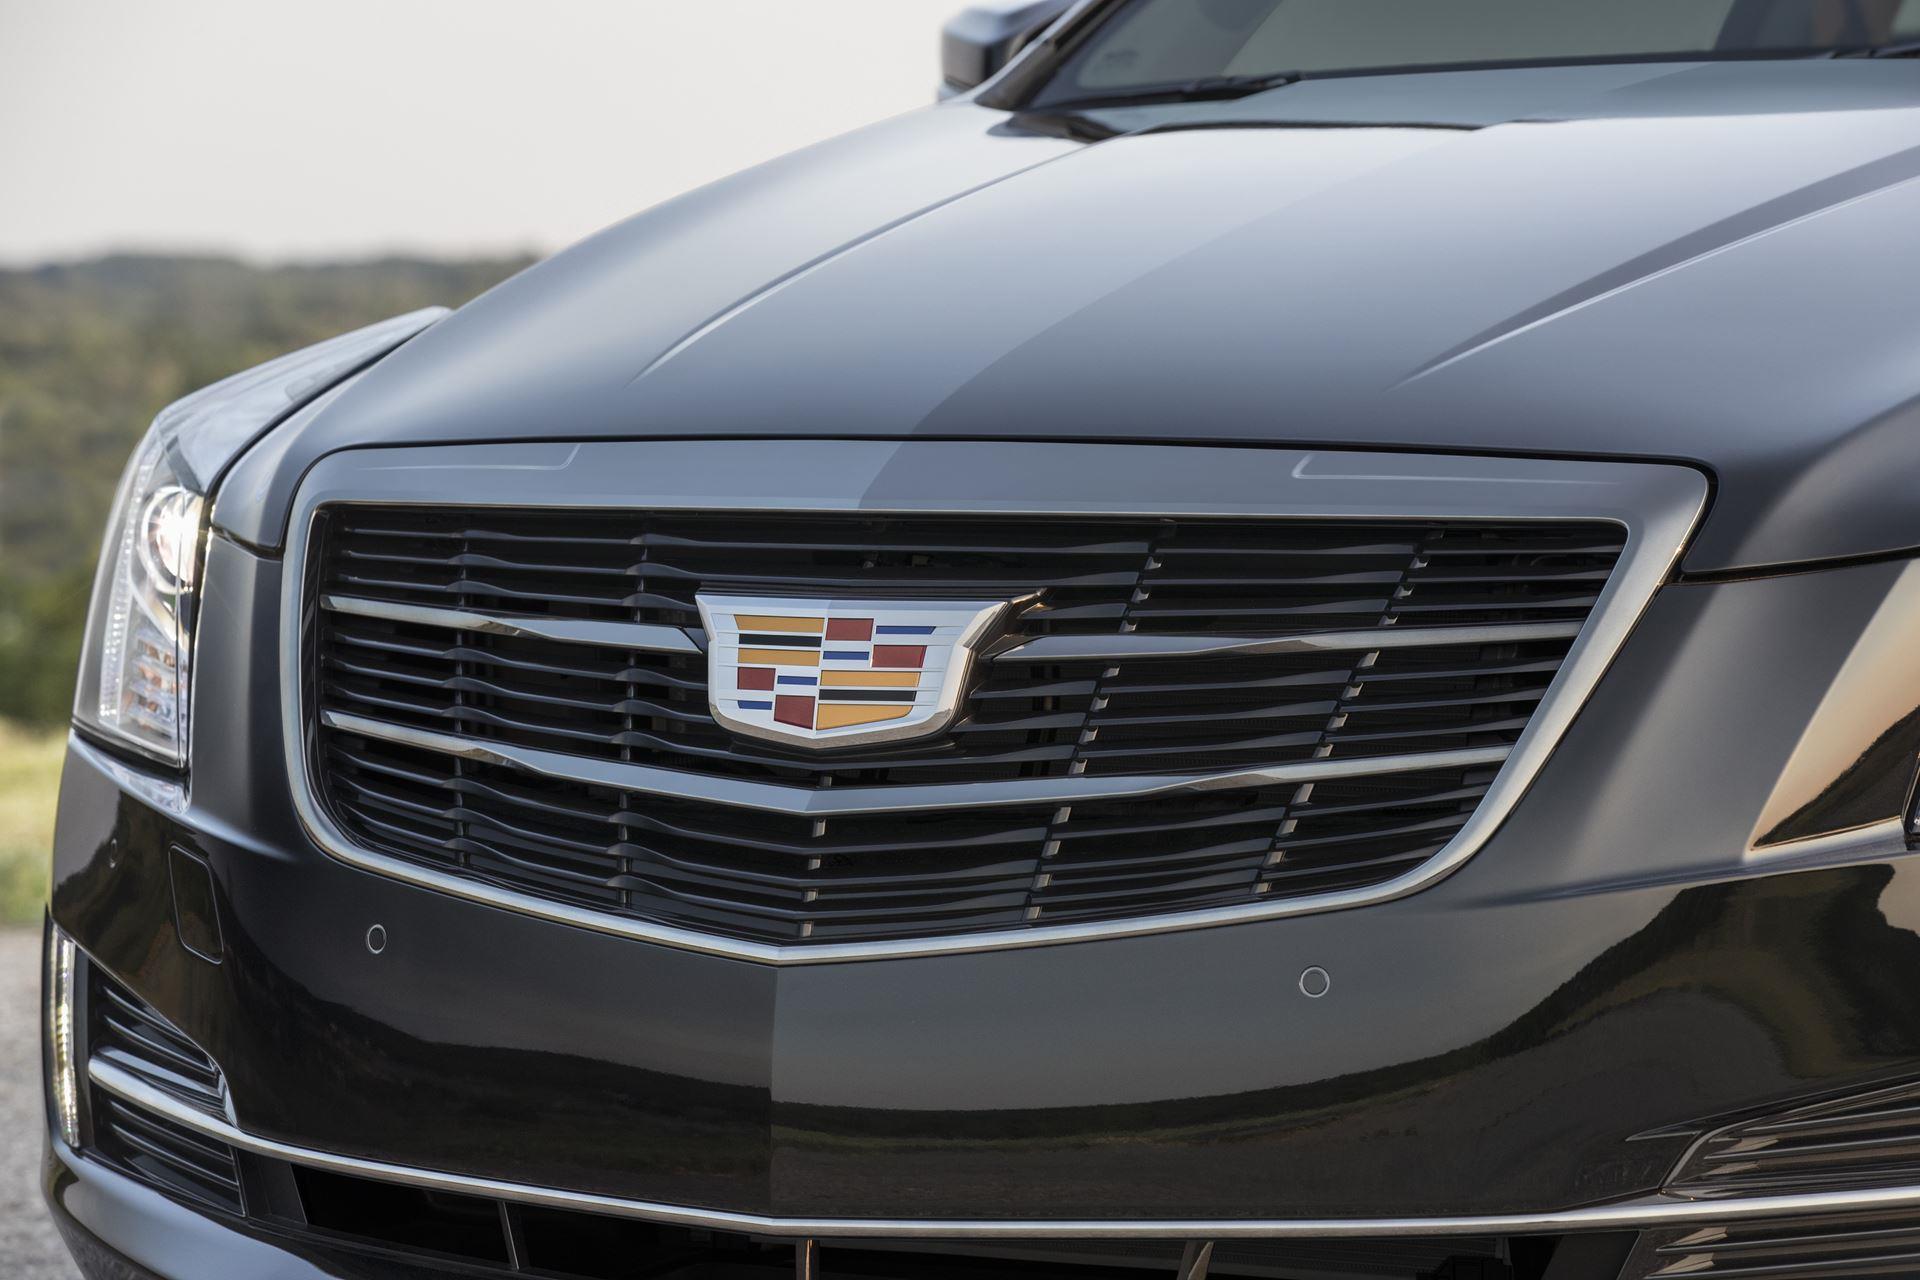 2018 Cadillac Ats News And Information Conceptcarz Com